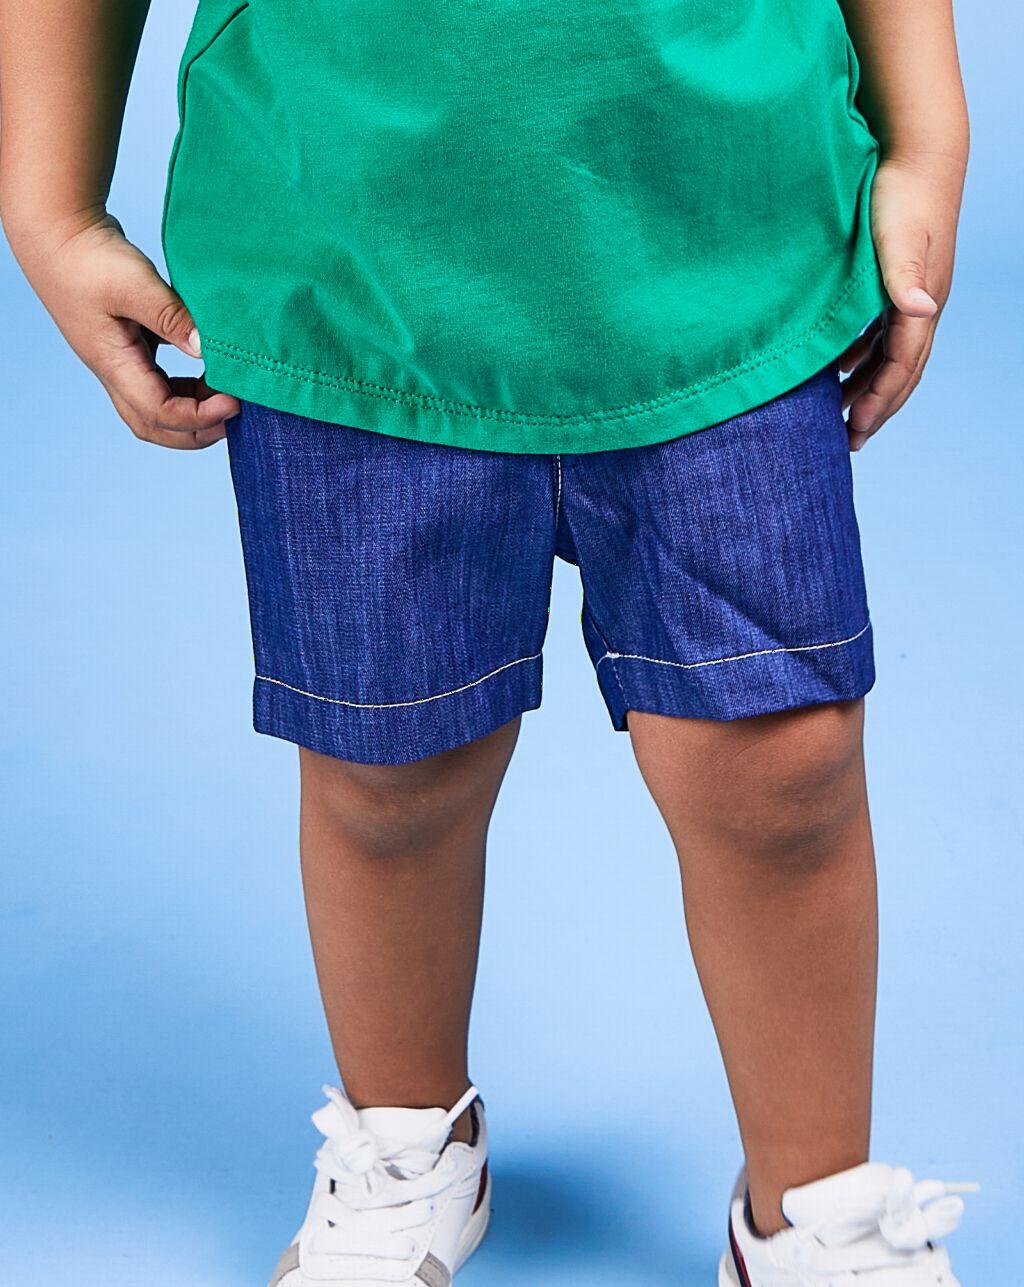 Pan con Chocolate: Shorts Roman